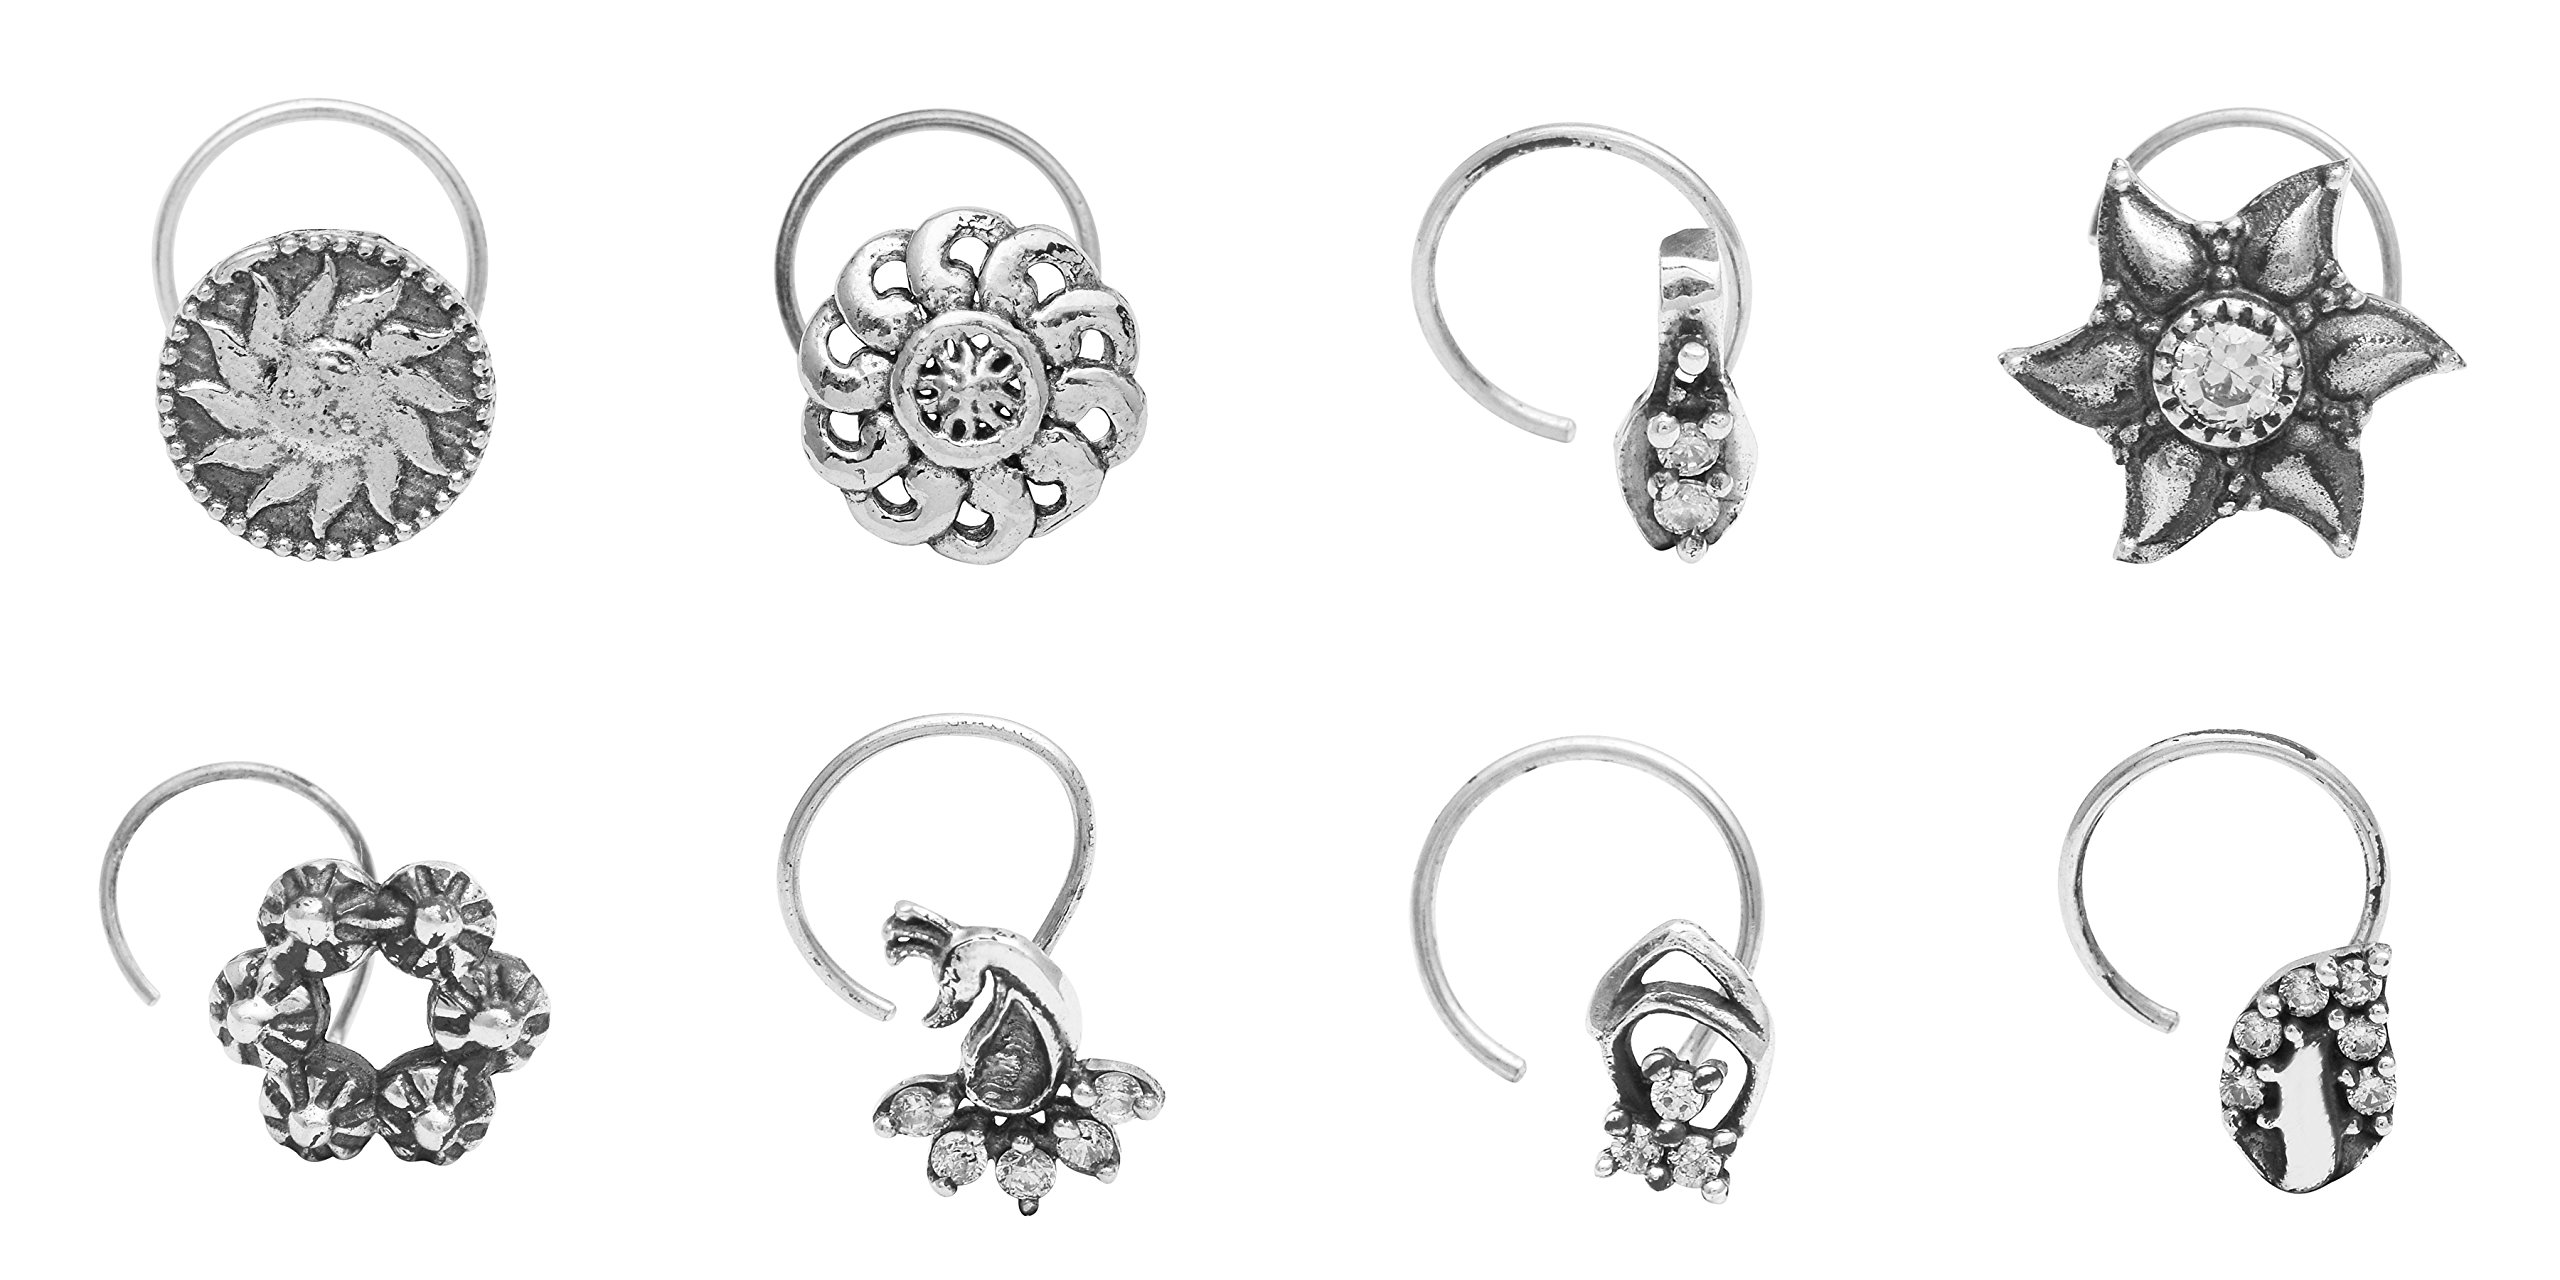 Sun Flower 925 Silver Oxidized Wedding Nose Pin For Women Set 8 Pieces Combo